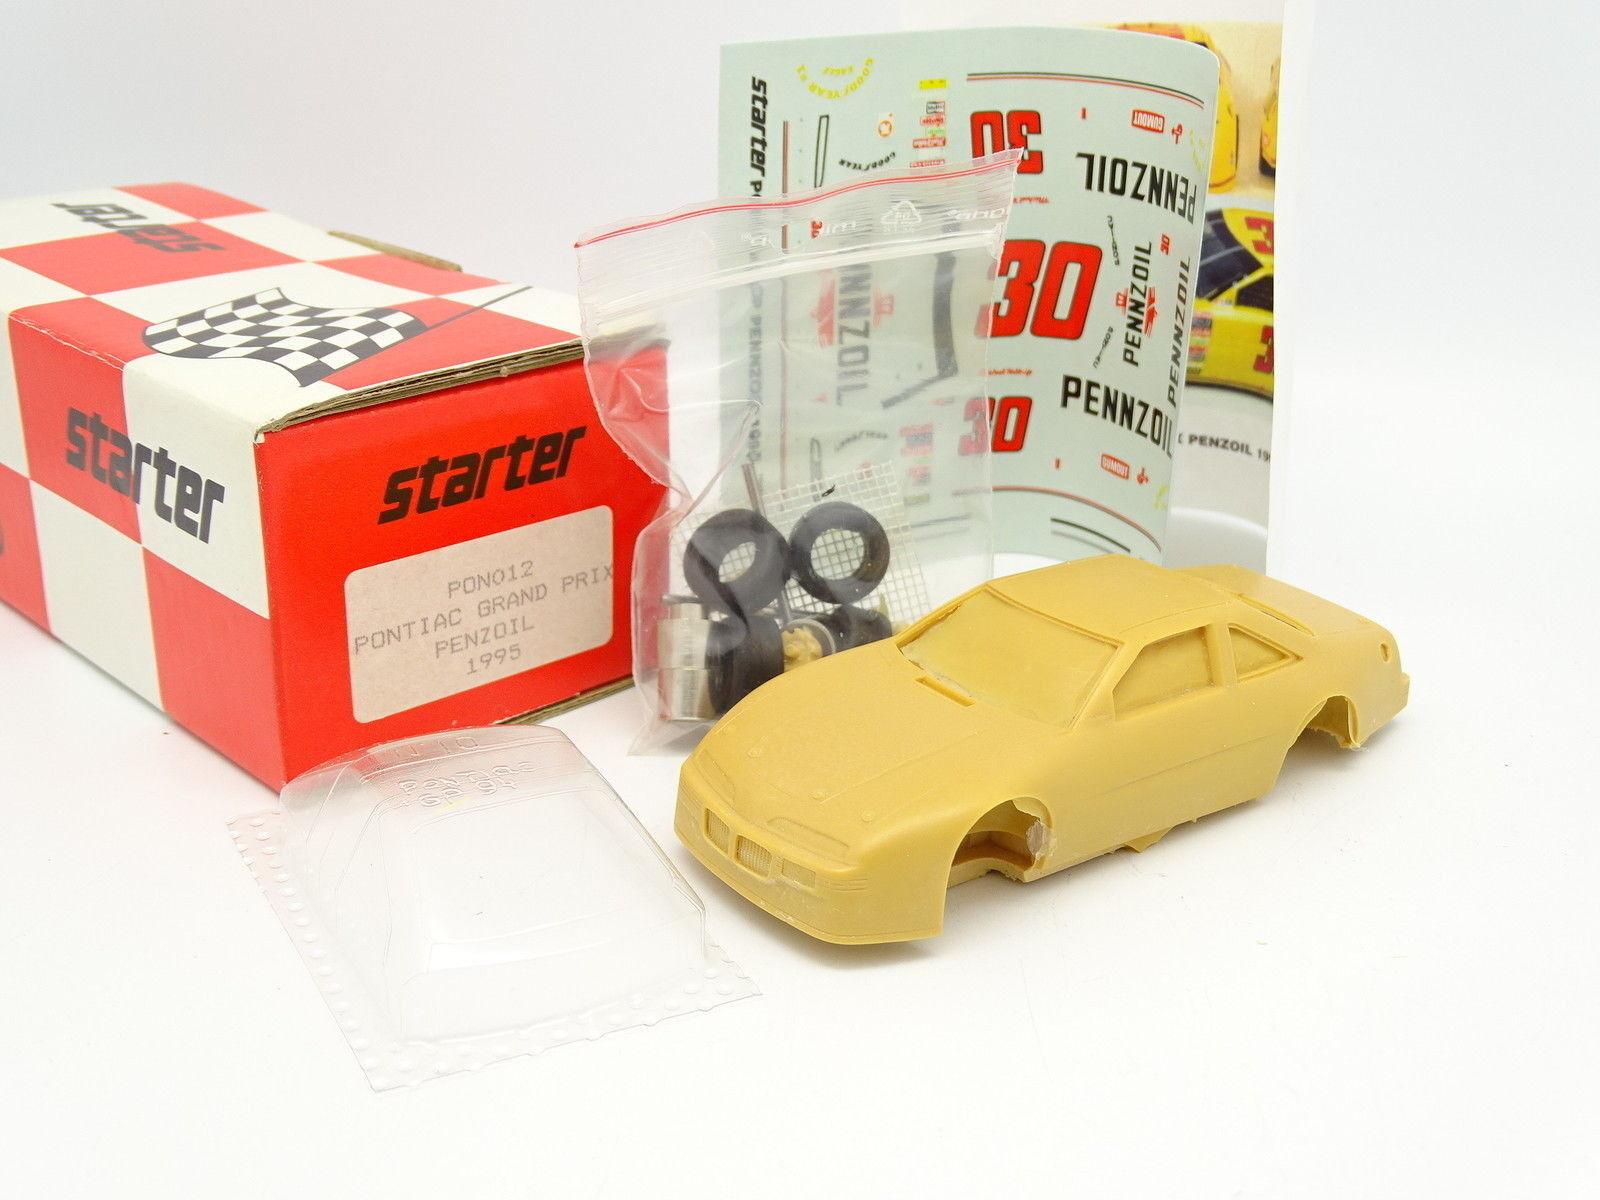 Starter Set zum Zusammenbauen 1 43 - Pontiac GRAND PRIX penzoil NASCAR 1995